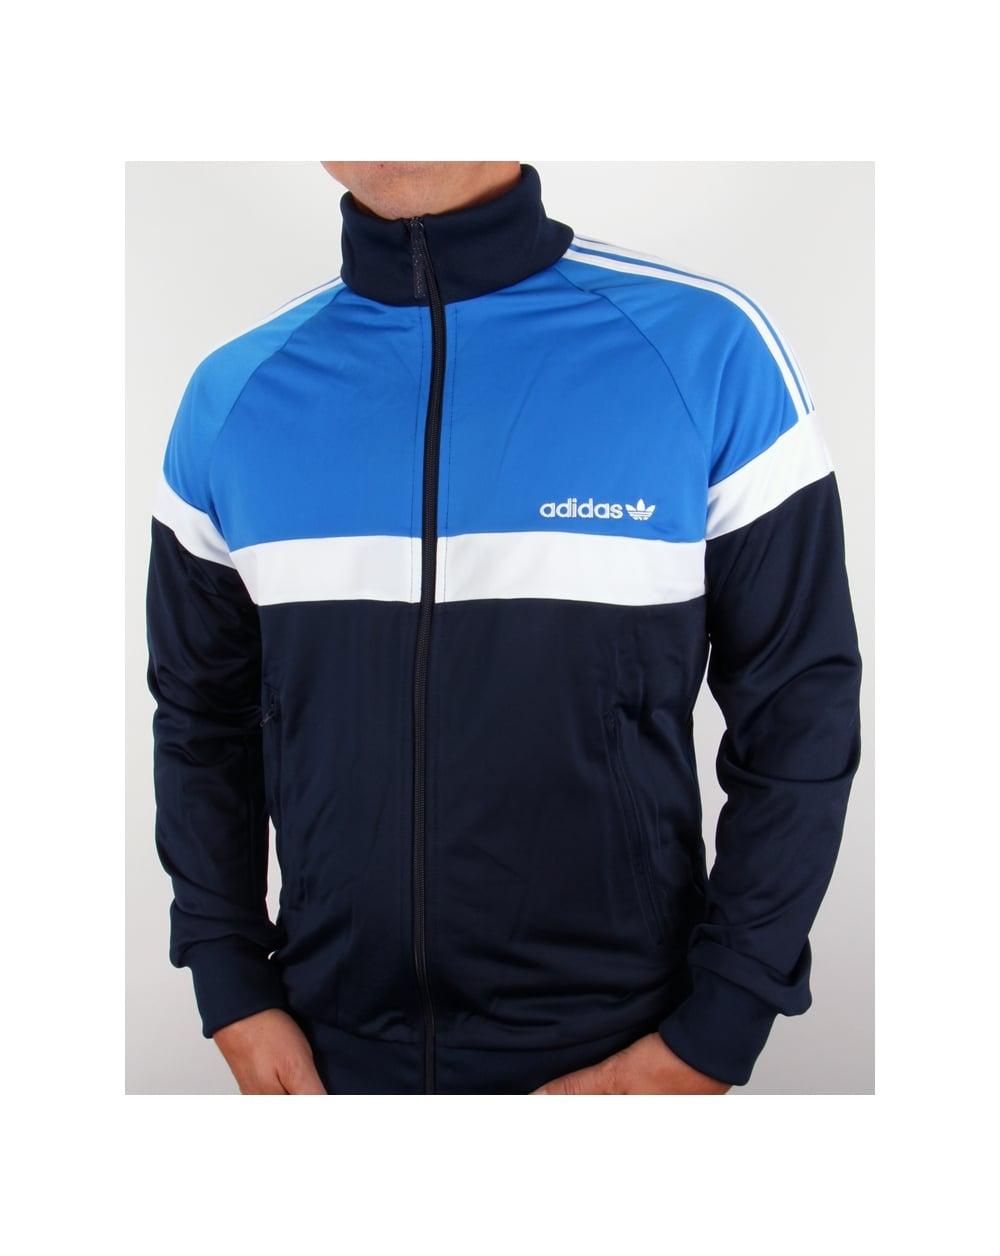 Adidas Top Ten Hi Sleek Bow Zip Trainers: Adidas Originals Itasca Track Top Navy/royal Blue